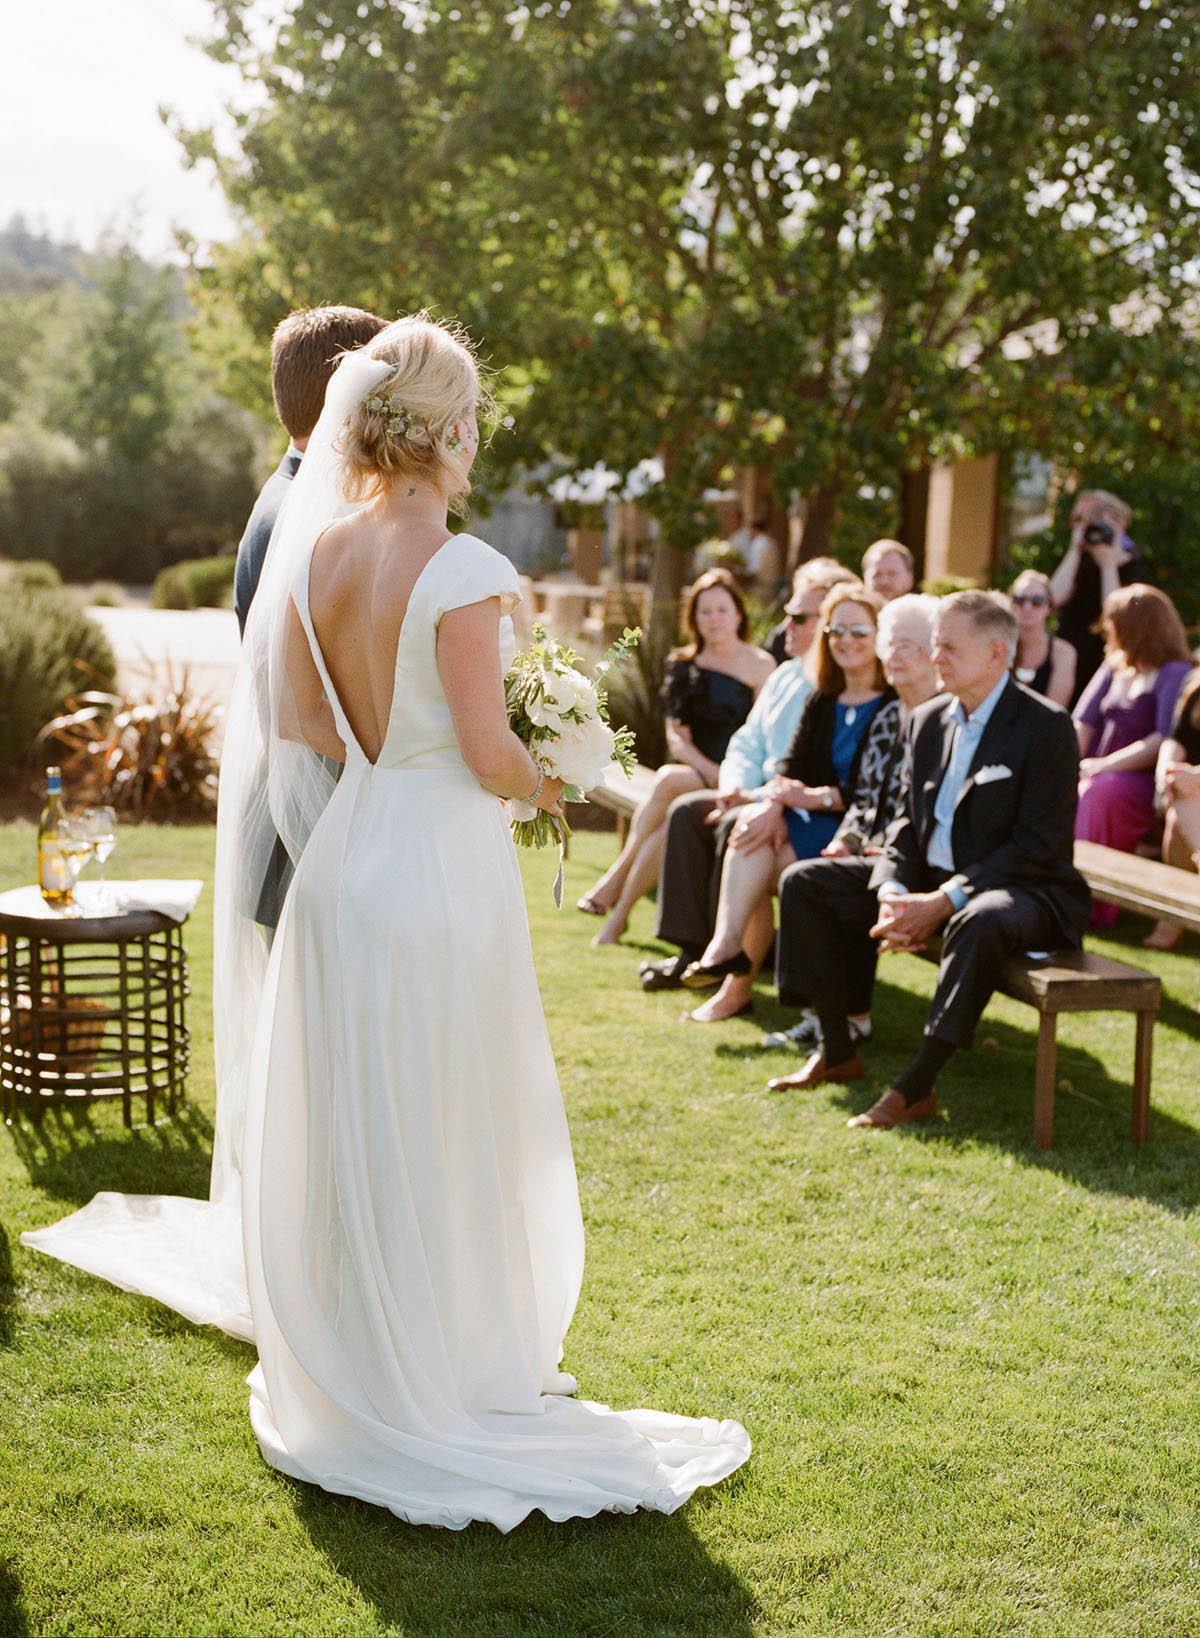 21-wedding-ceremony.jpg